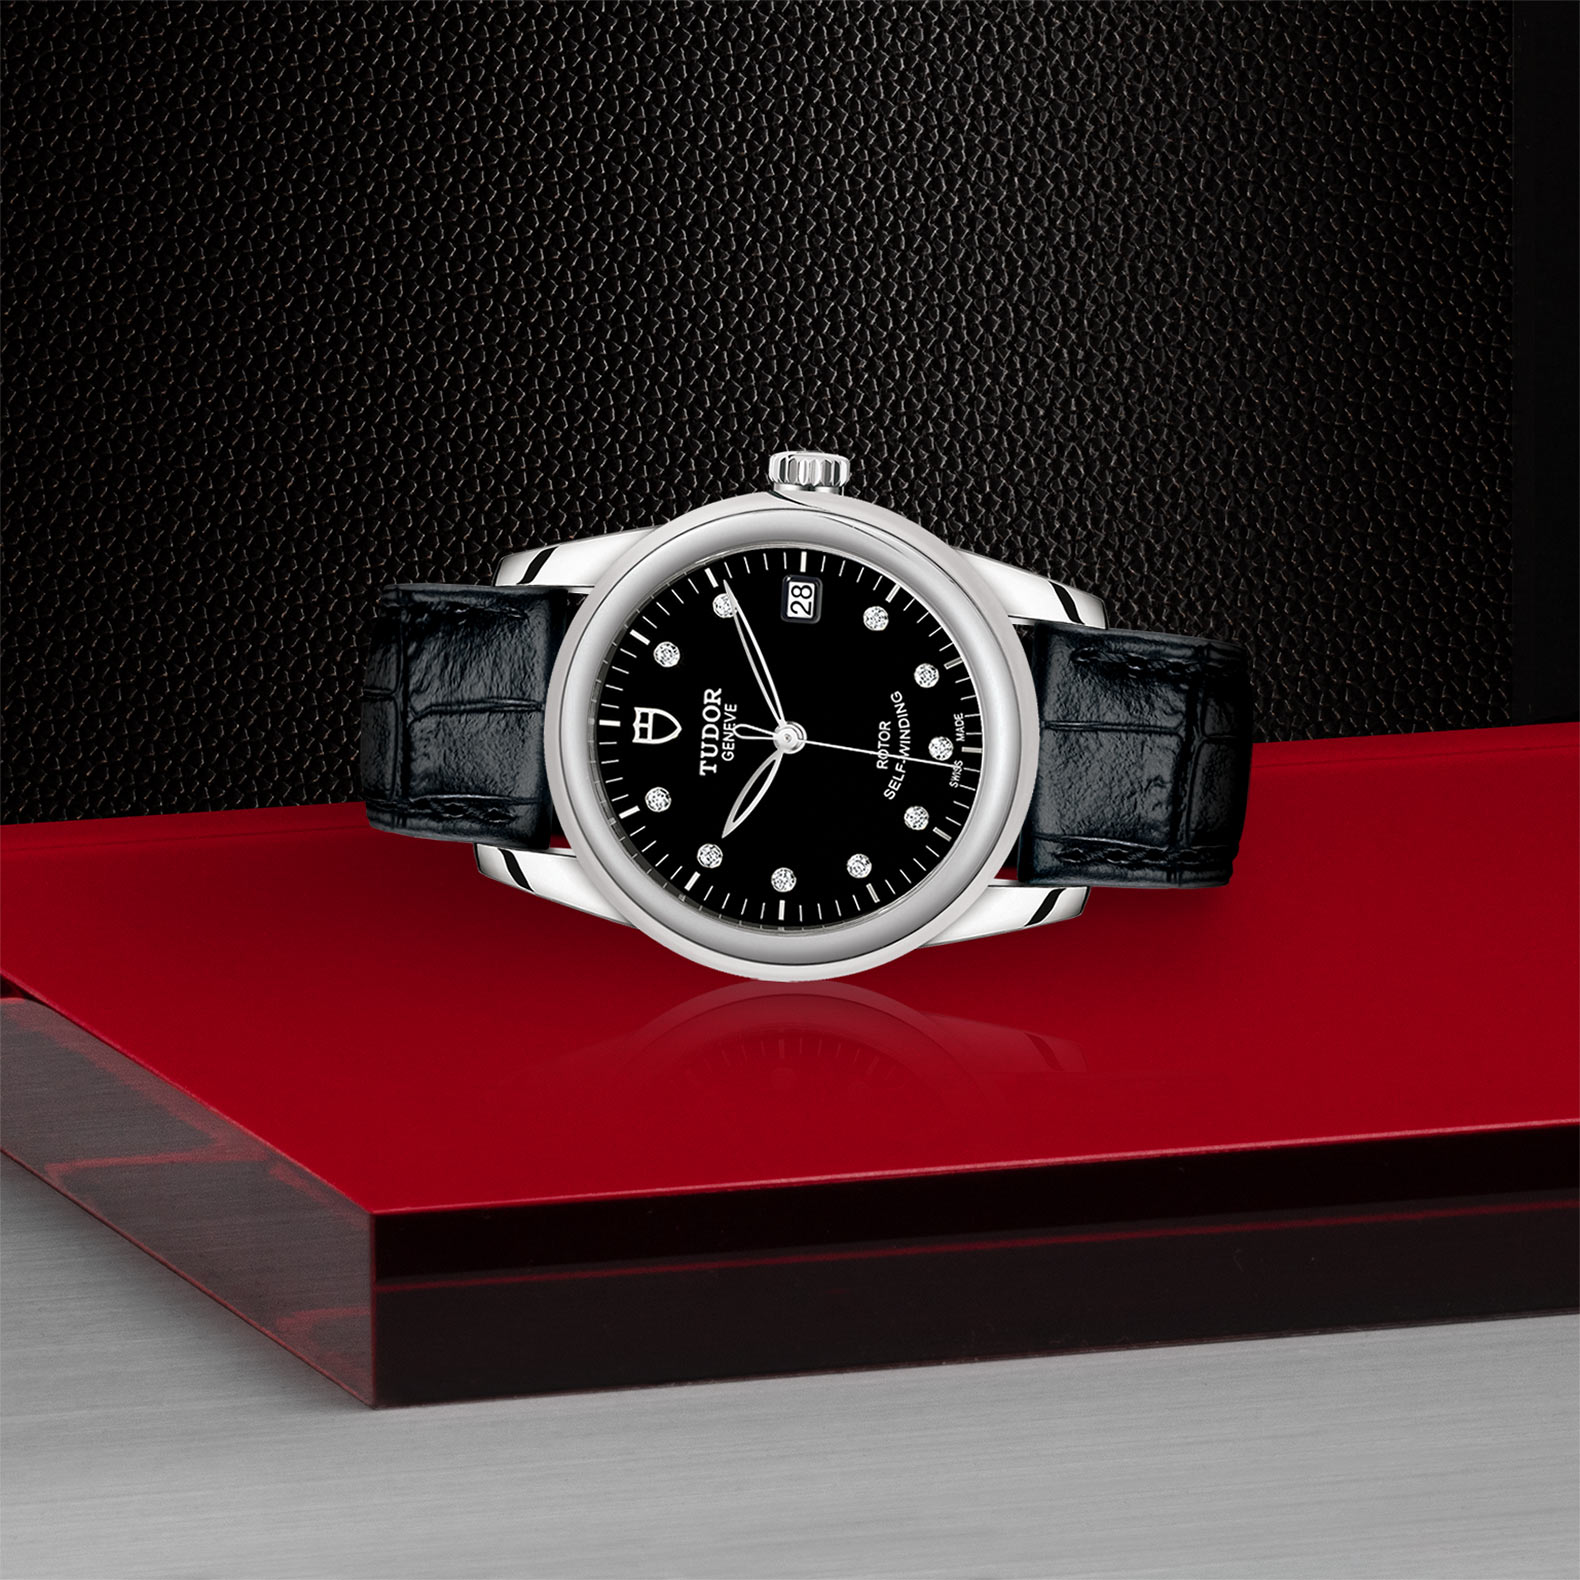 TUDOR Glamour Date - M55000-0013